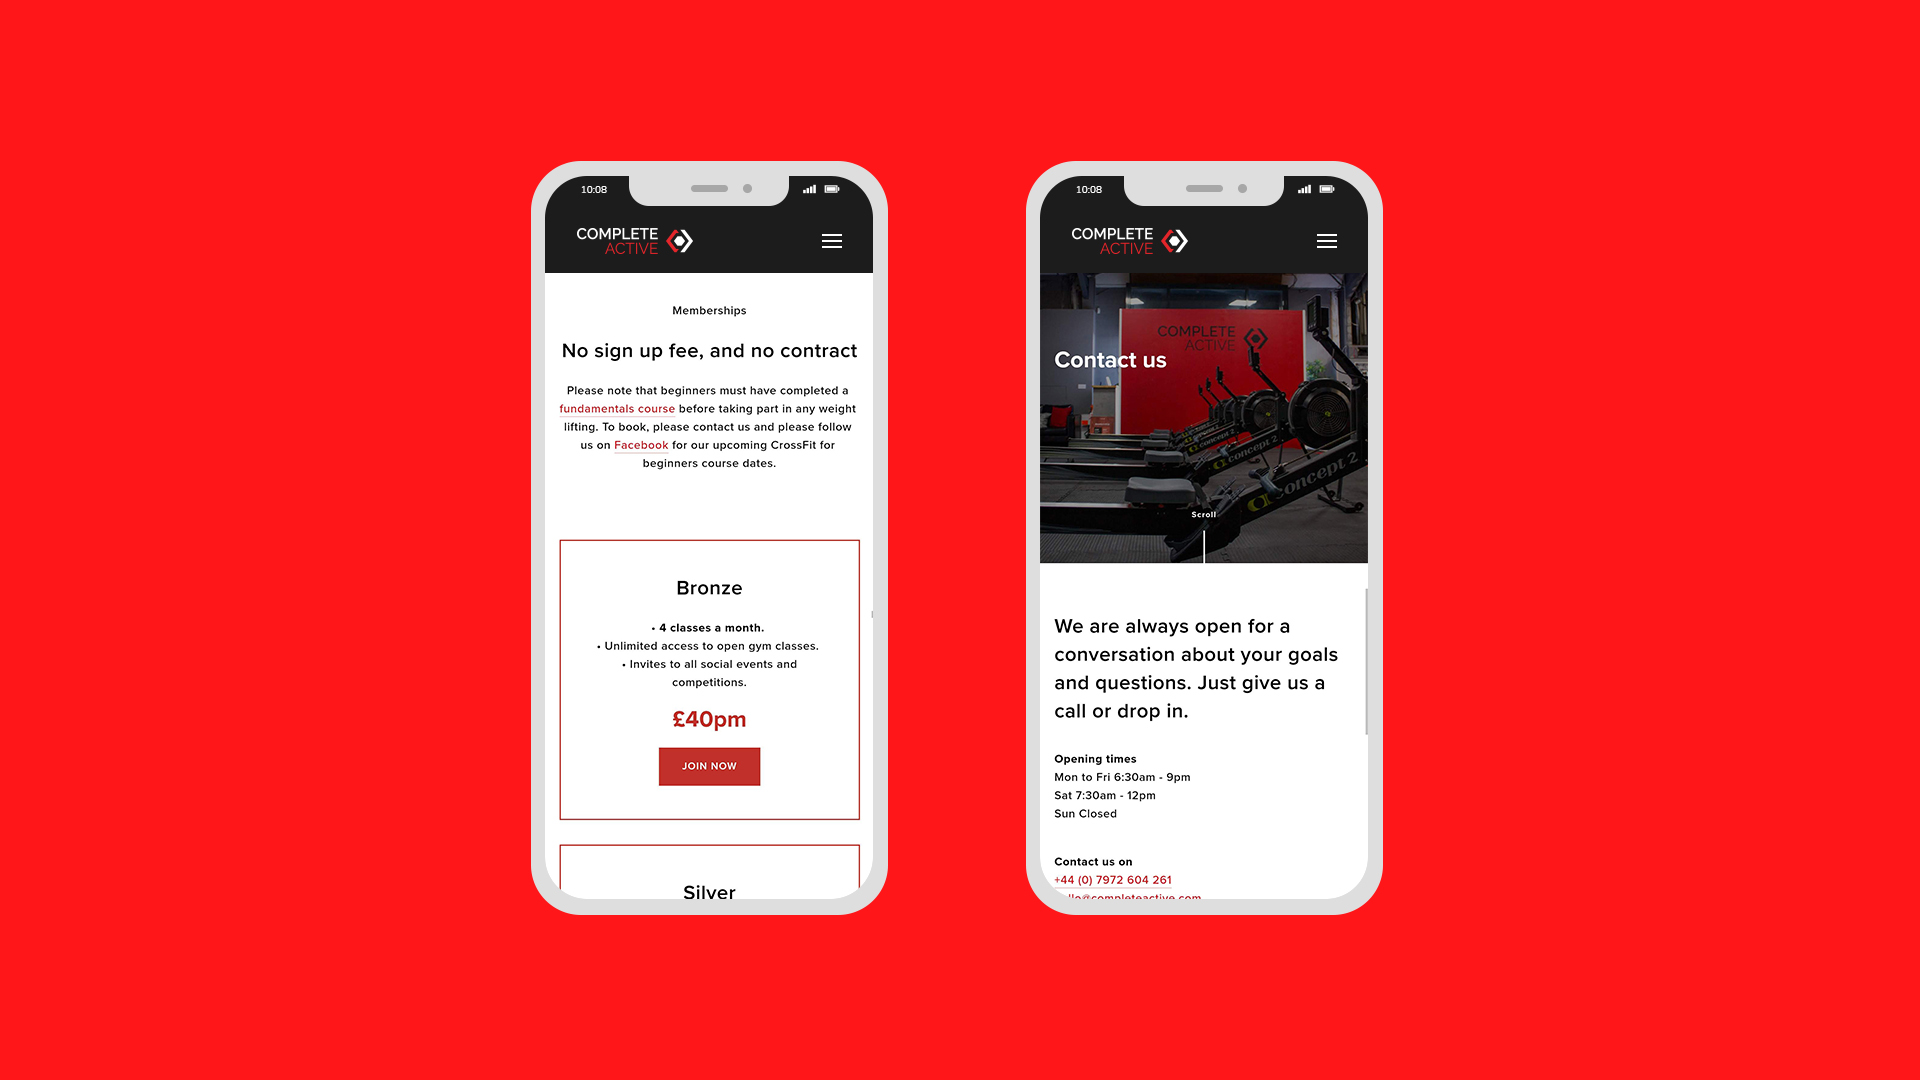 05-Lobo-Creative-Complete-Active-digital-website-design-development-in-Bournemouth.jpg